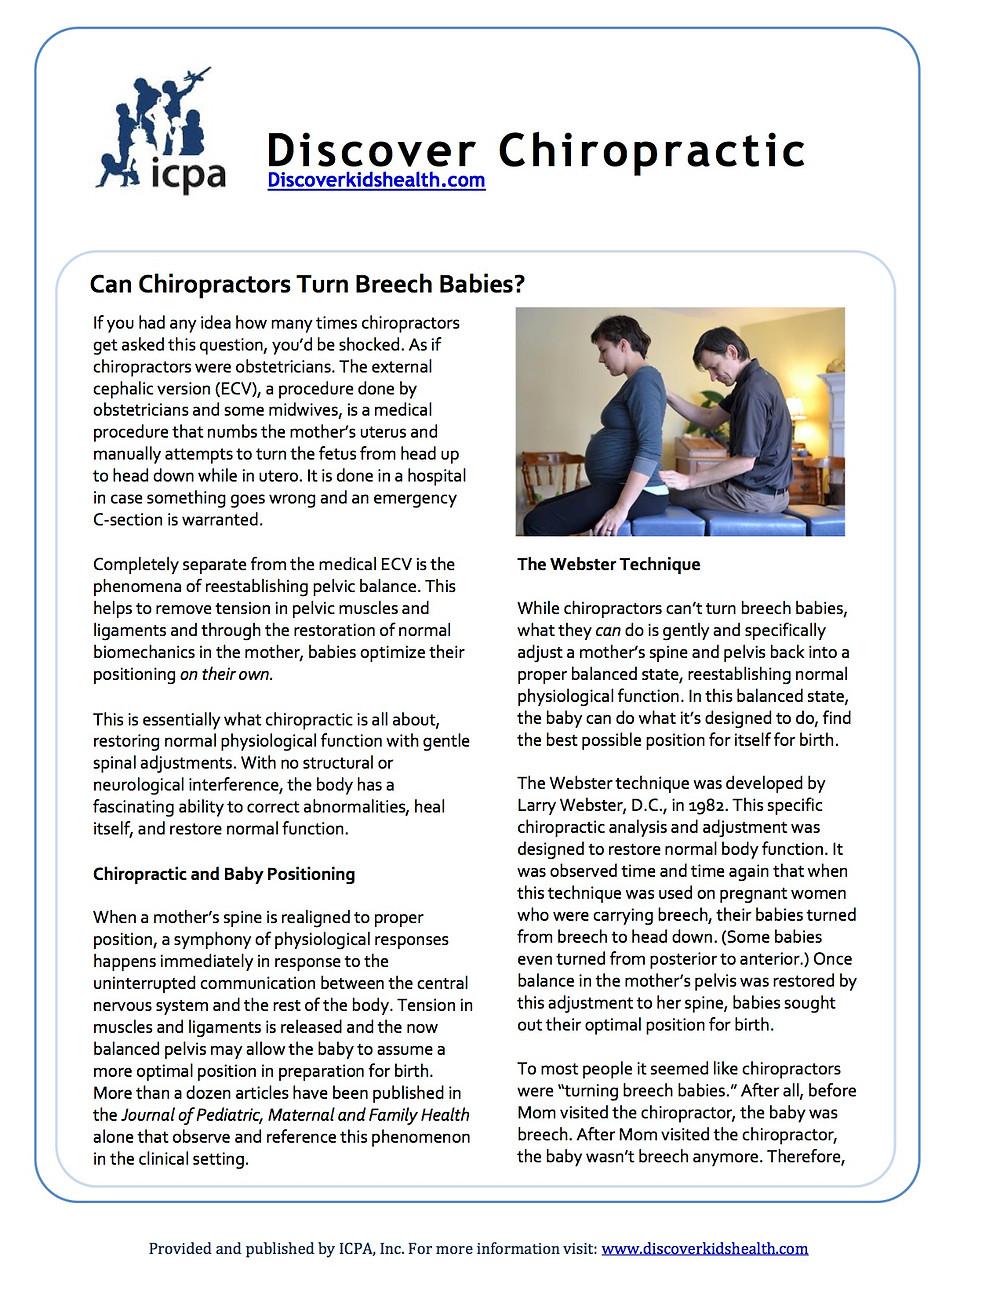 Chiropractic breech pregnancy